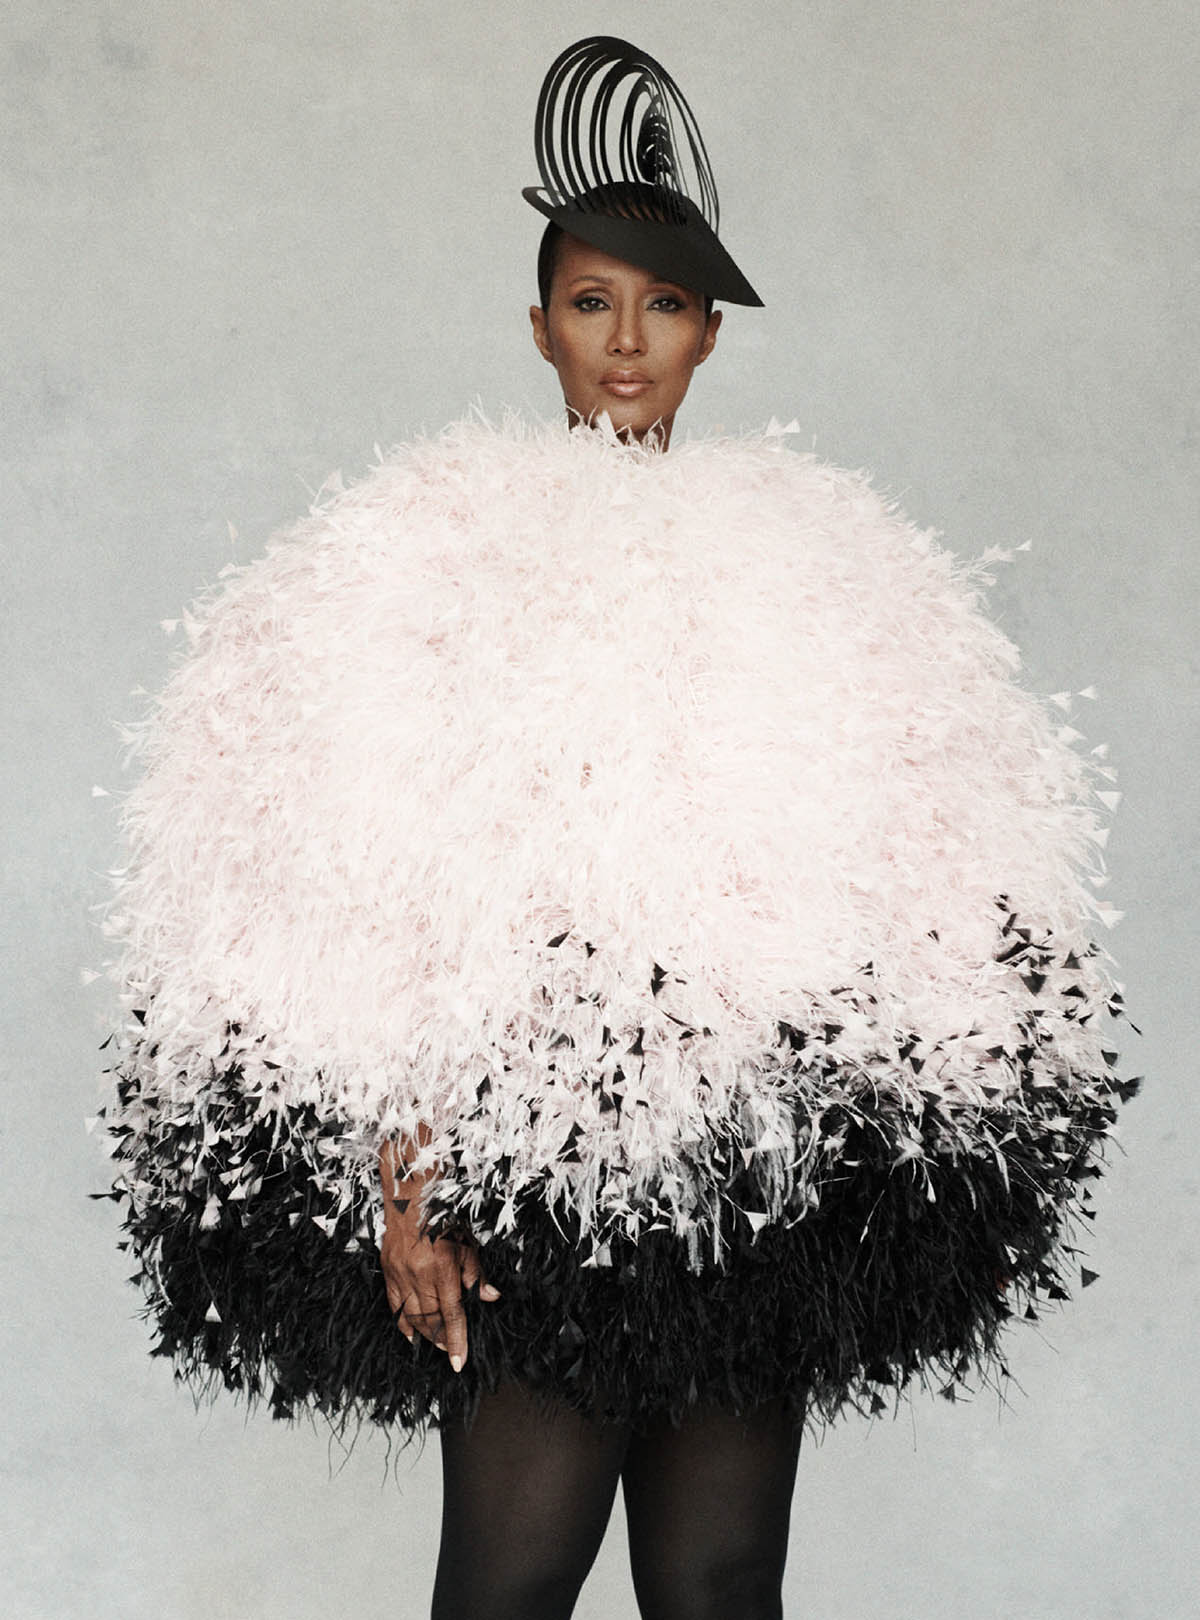 Iman covers Harper's Bazaar UK February 2021 by Paola Kudacki